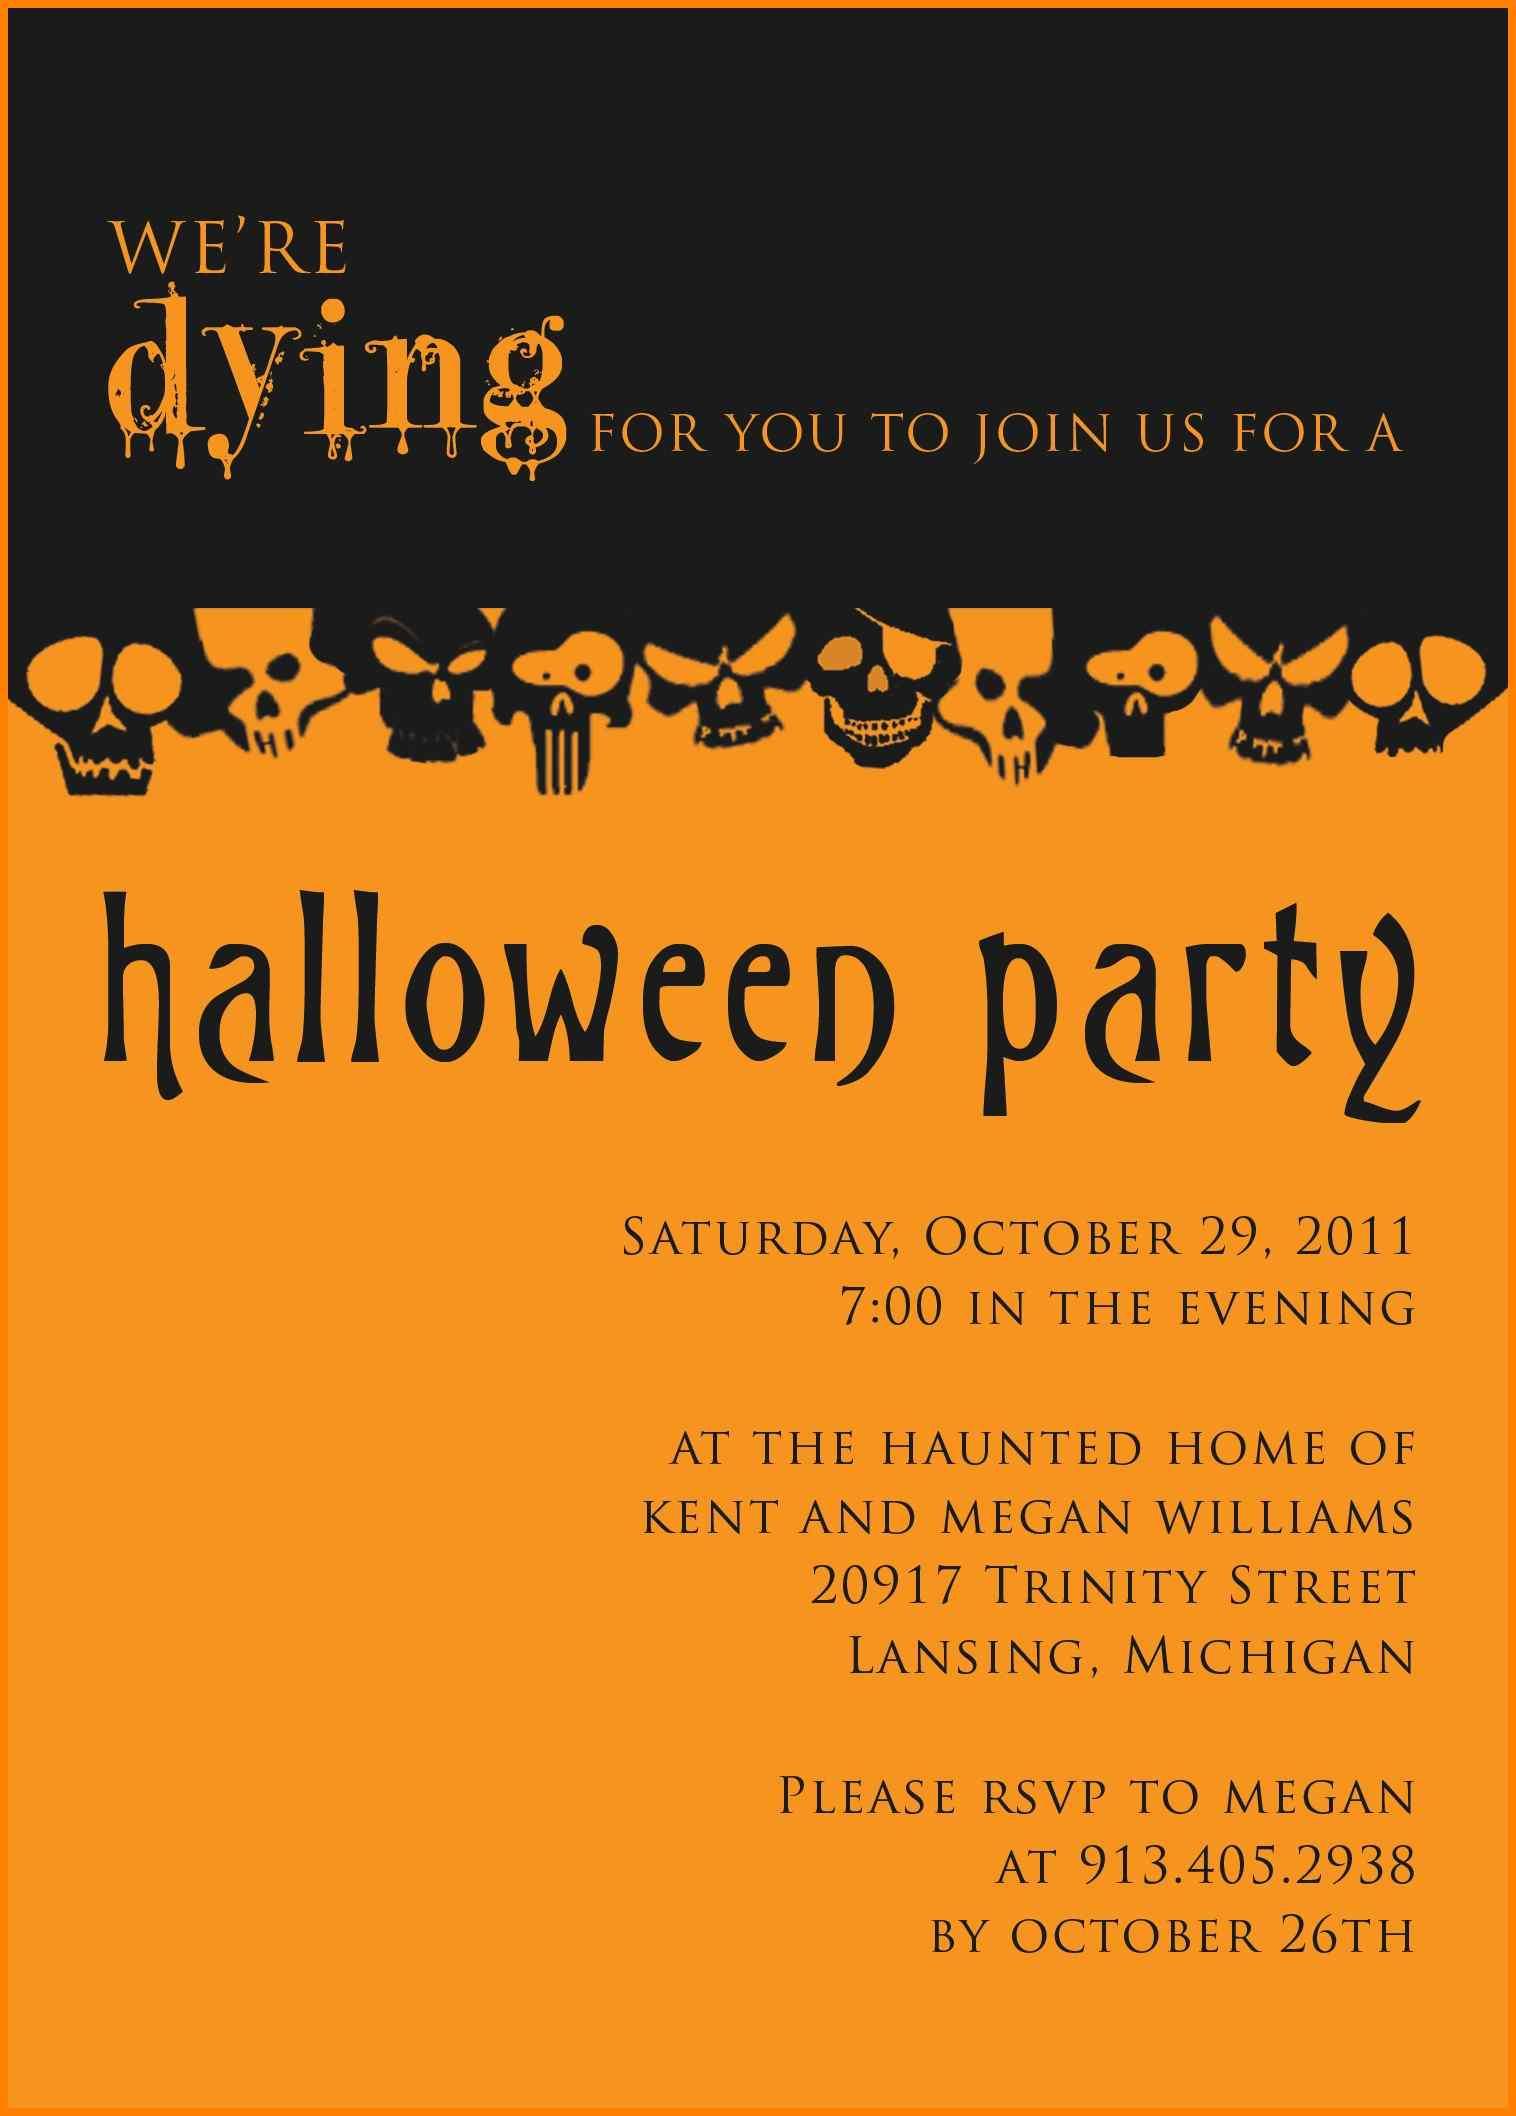 82 Create Custom Halloween Party Invitation Template Design Online inside sizing 1516 X 2116